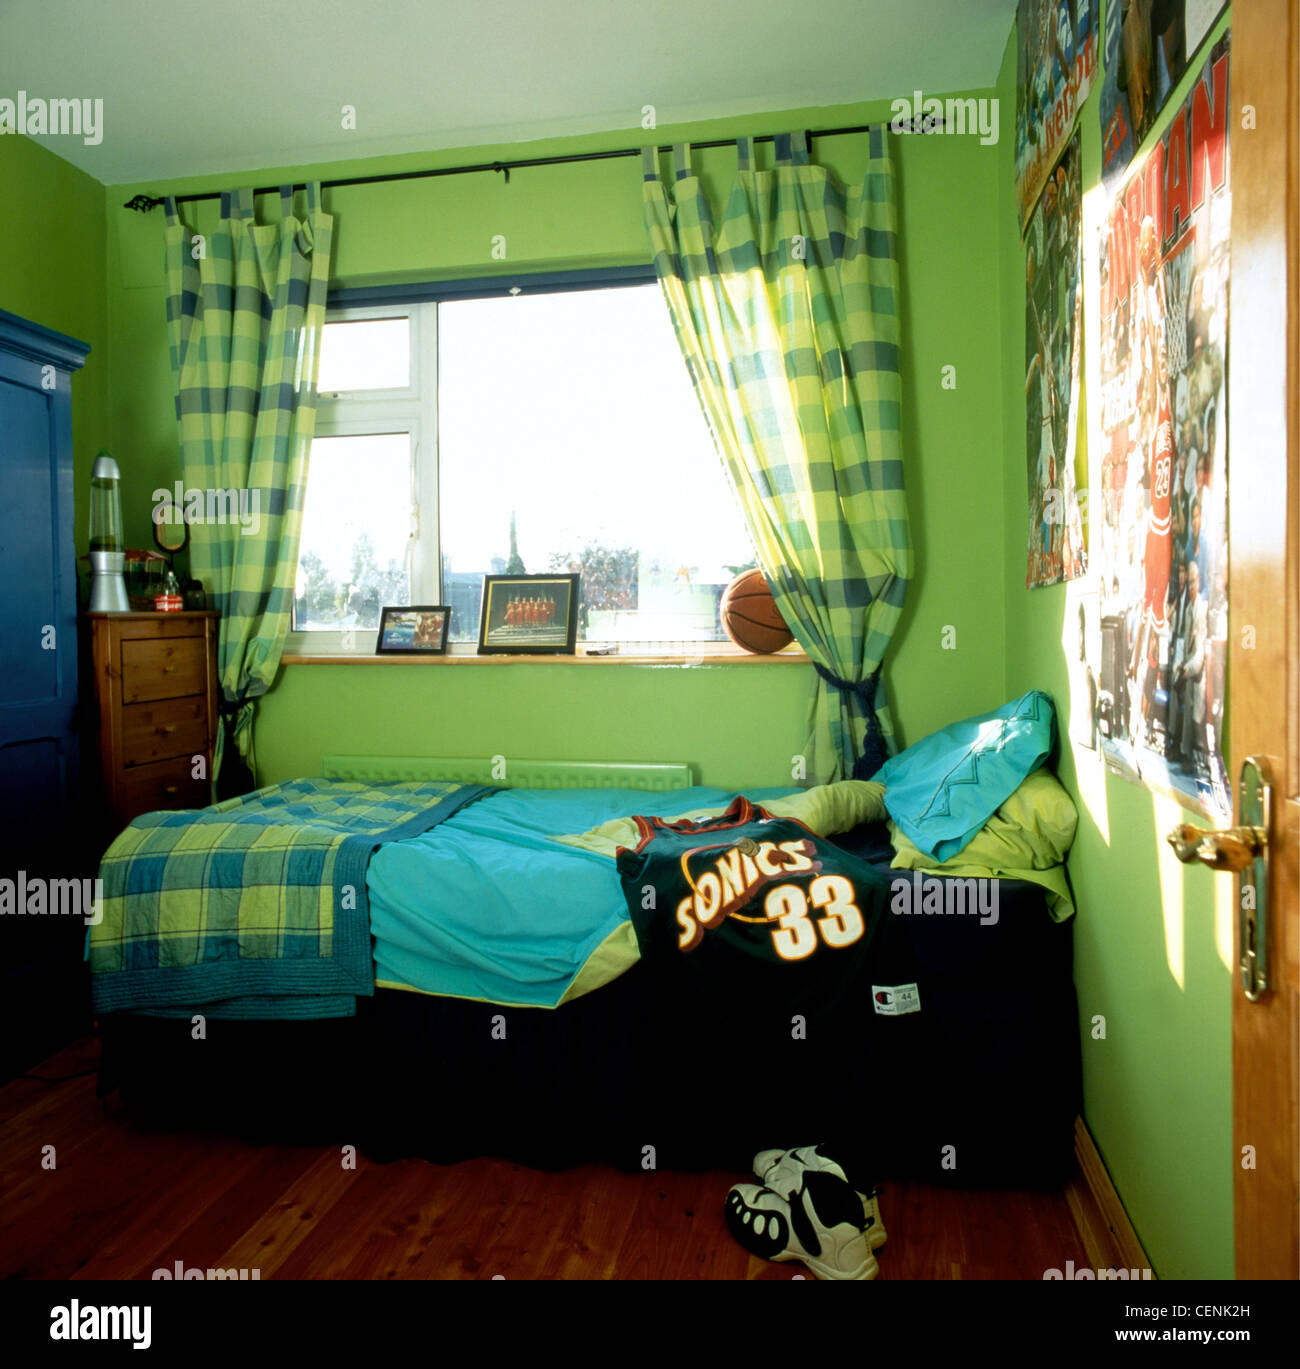 Feng Shui Bedroom Photos & Feng Shui Bedroom Images - Alamy